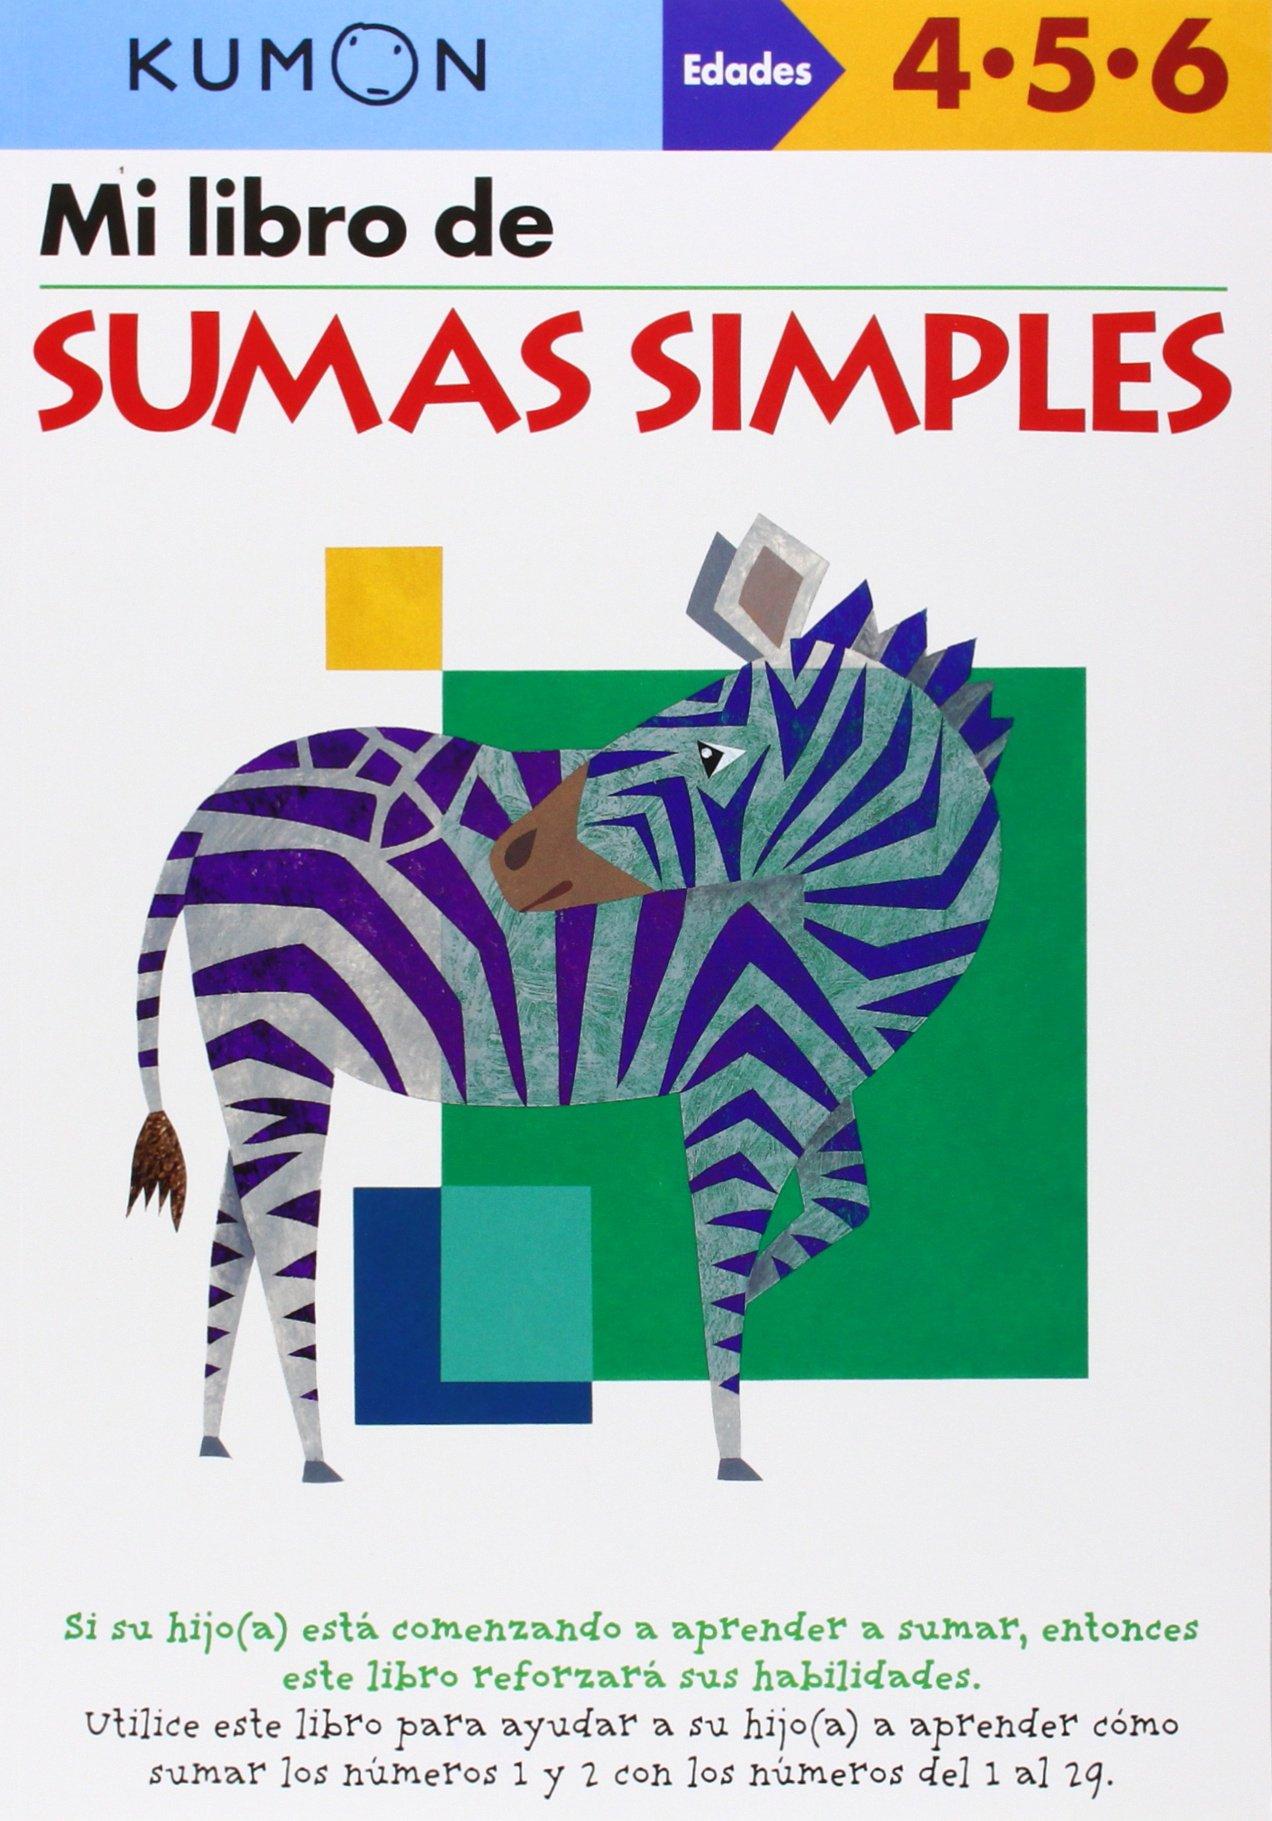 Mi Libro de Sumas Simples (Kumon Workbooks: Basic Skills) (Spanish Edition)  (Spanish) Paperback – March 1, 2009